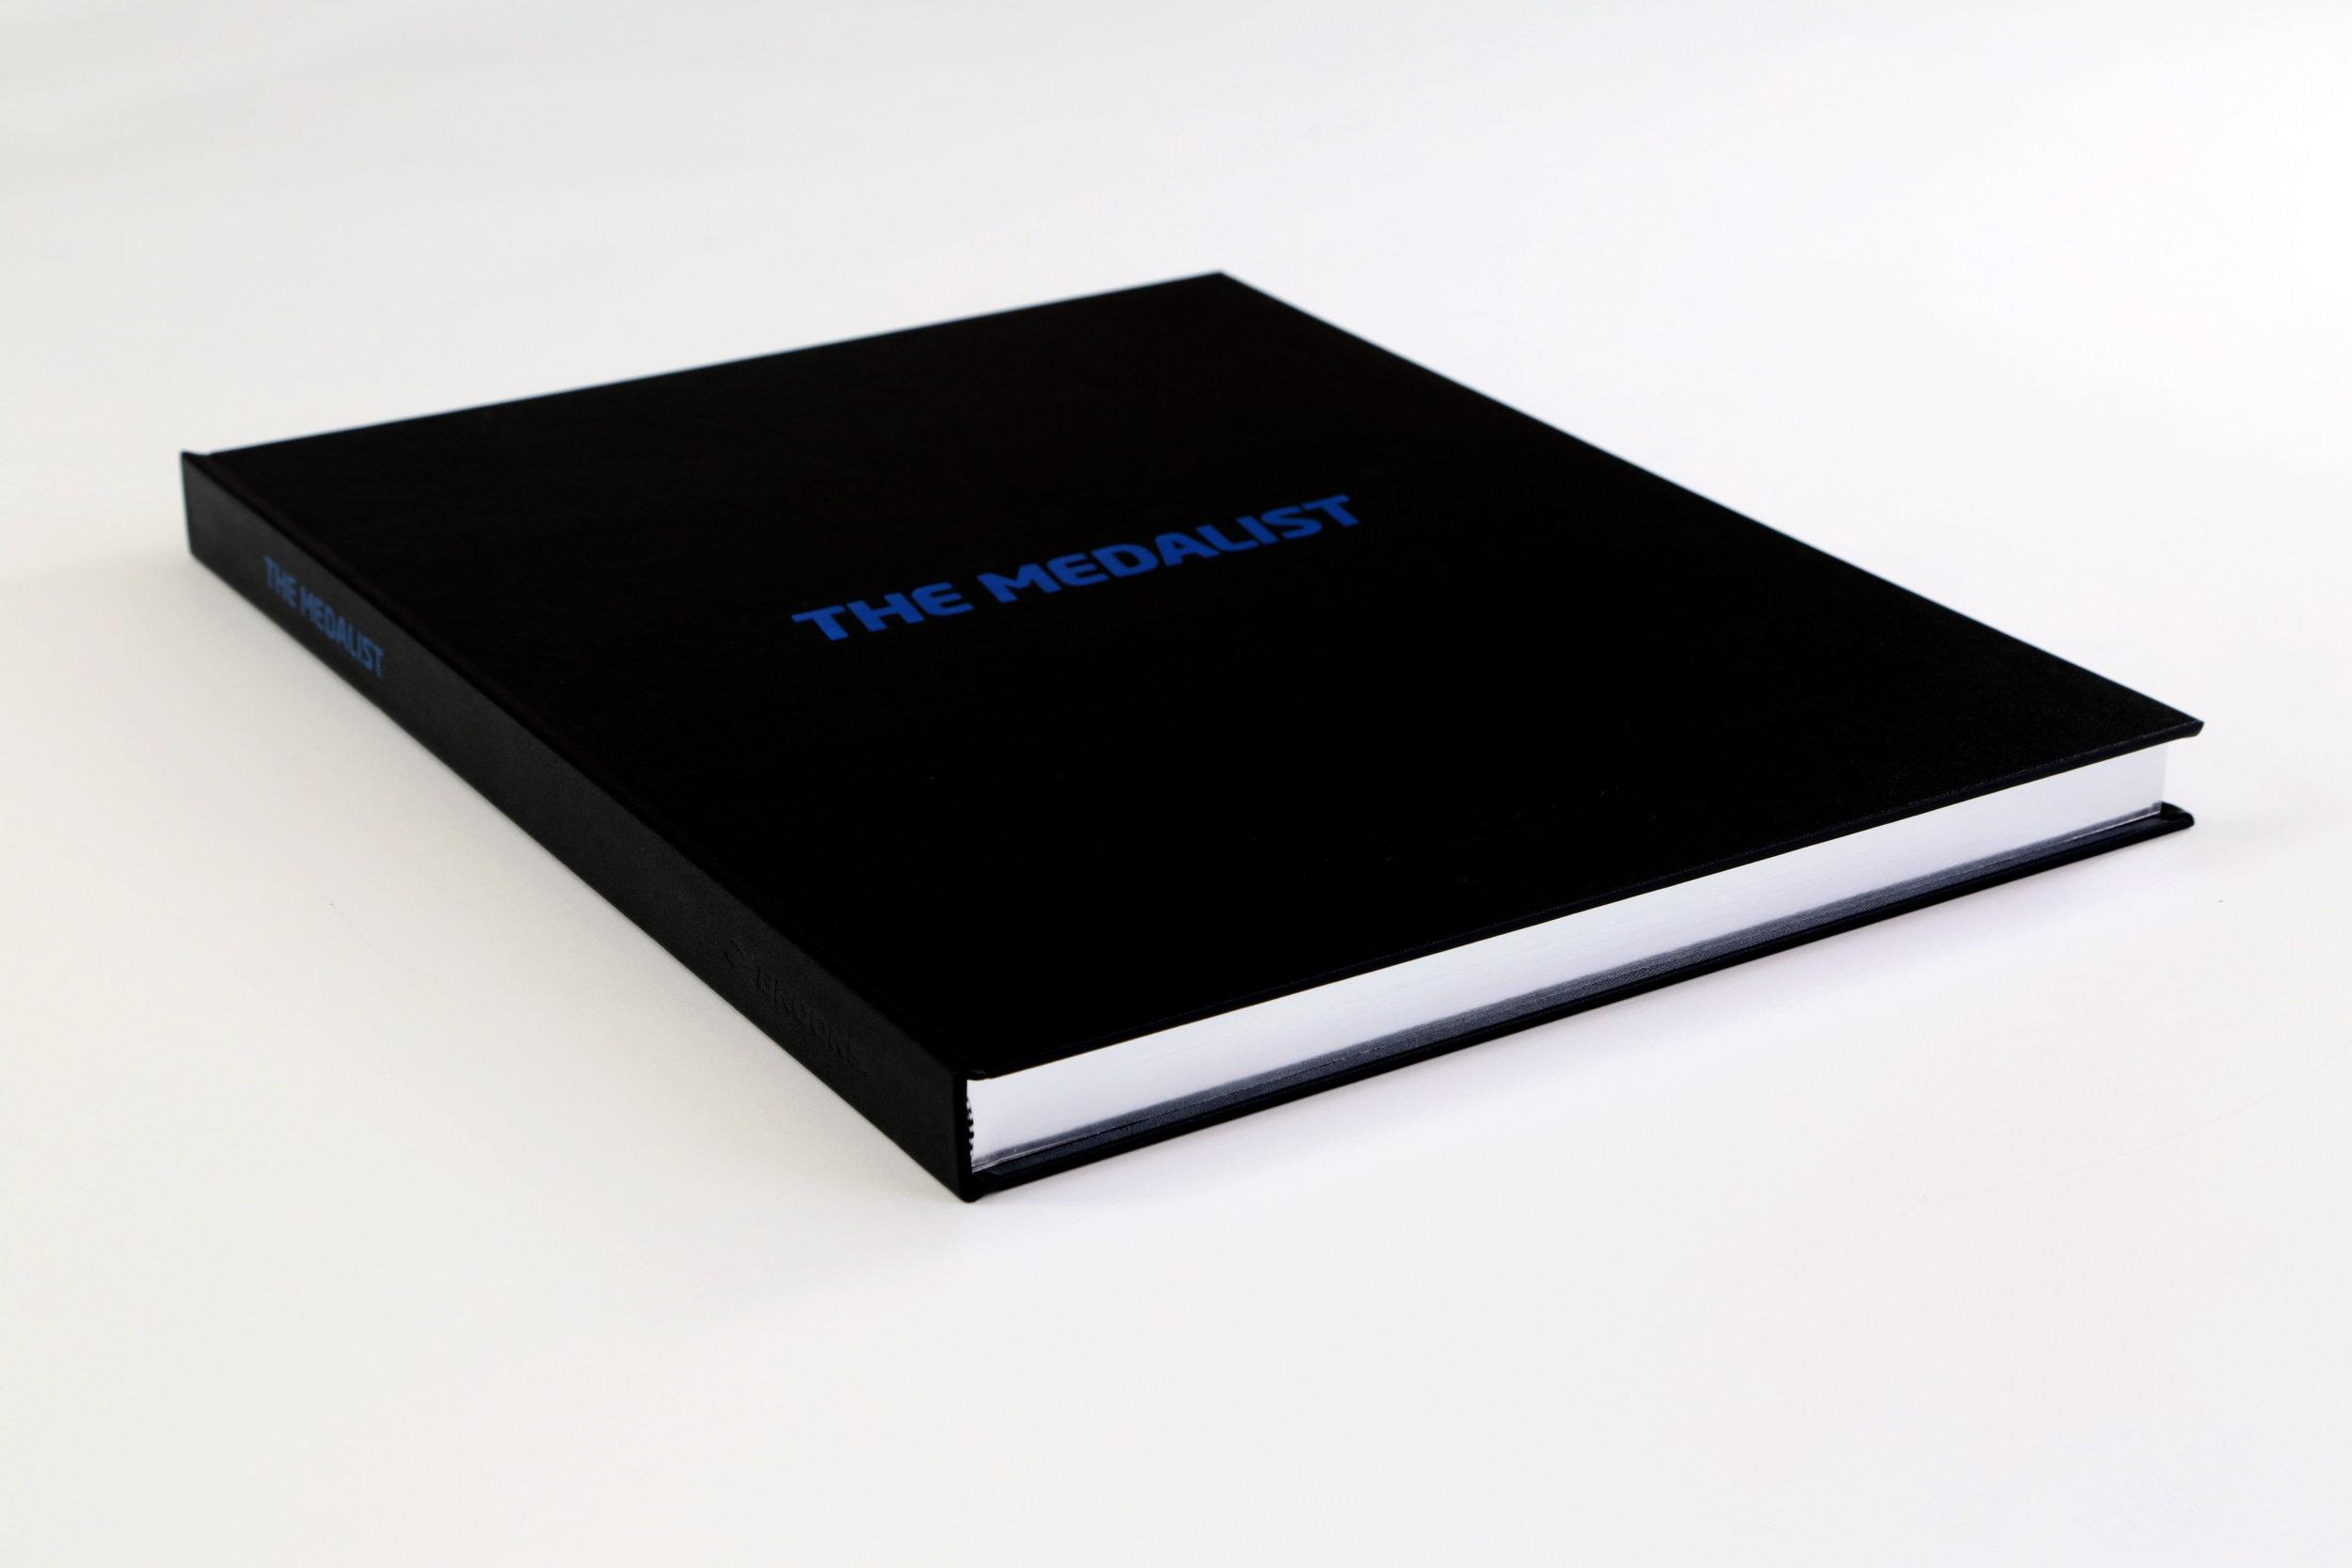 brooks_book_1.jpg